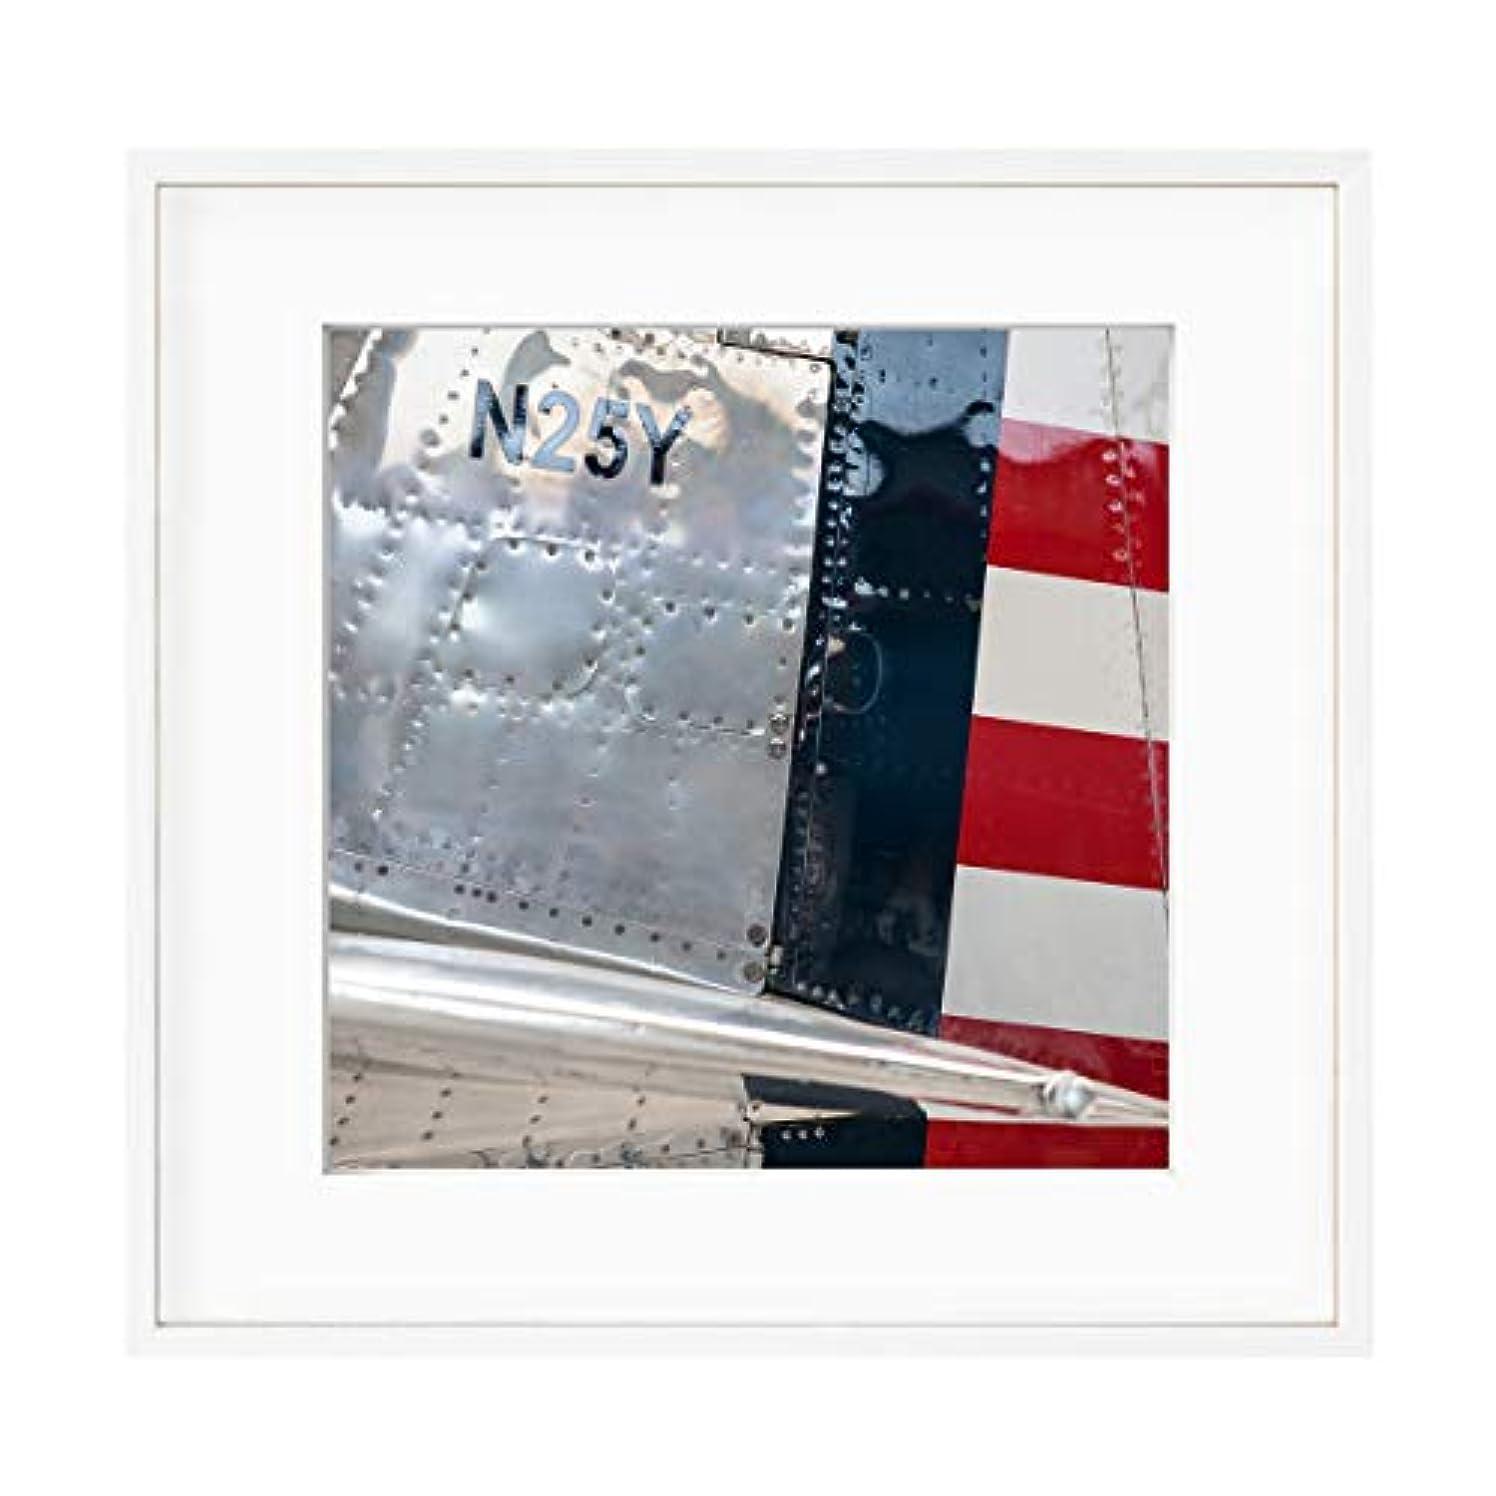 Aeroplane Bodywork, Satin Black Aluminium Frame, with Mount, Multicolored, 40x40